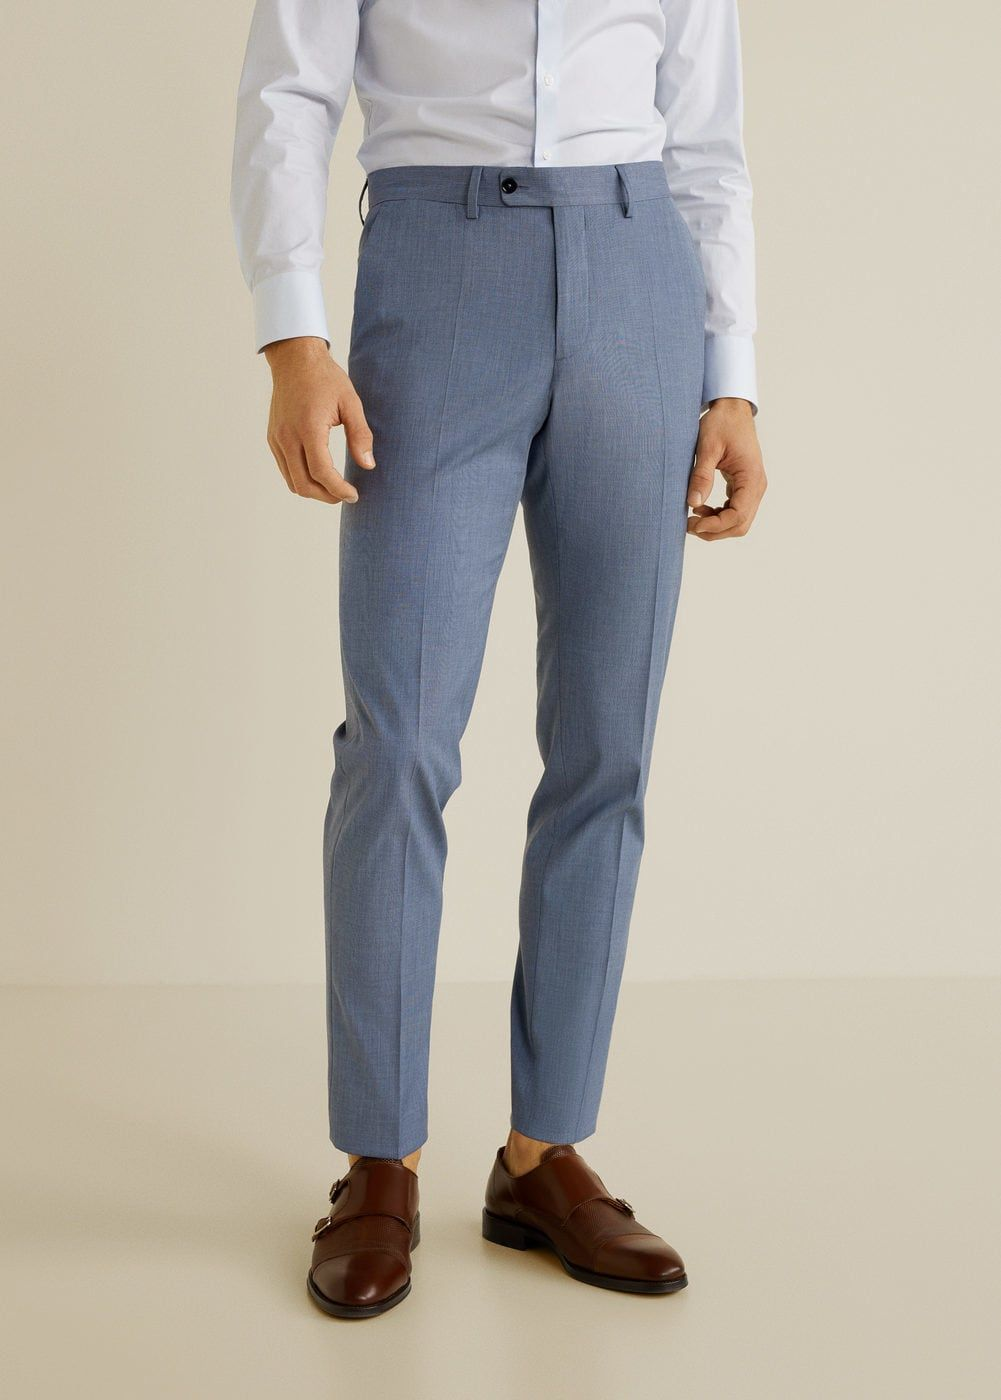 c85b8d465d461 Dar kesim filafil takım pantolonu - Erkek   Şaps   Pantolon, Mango ...